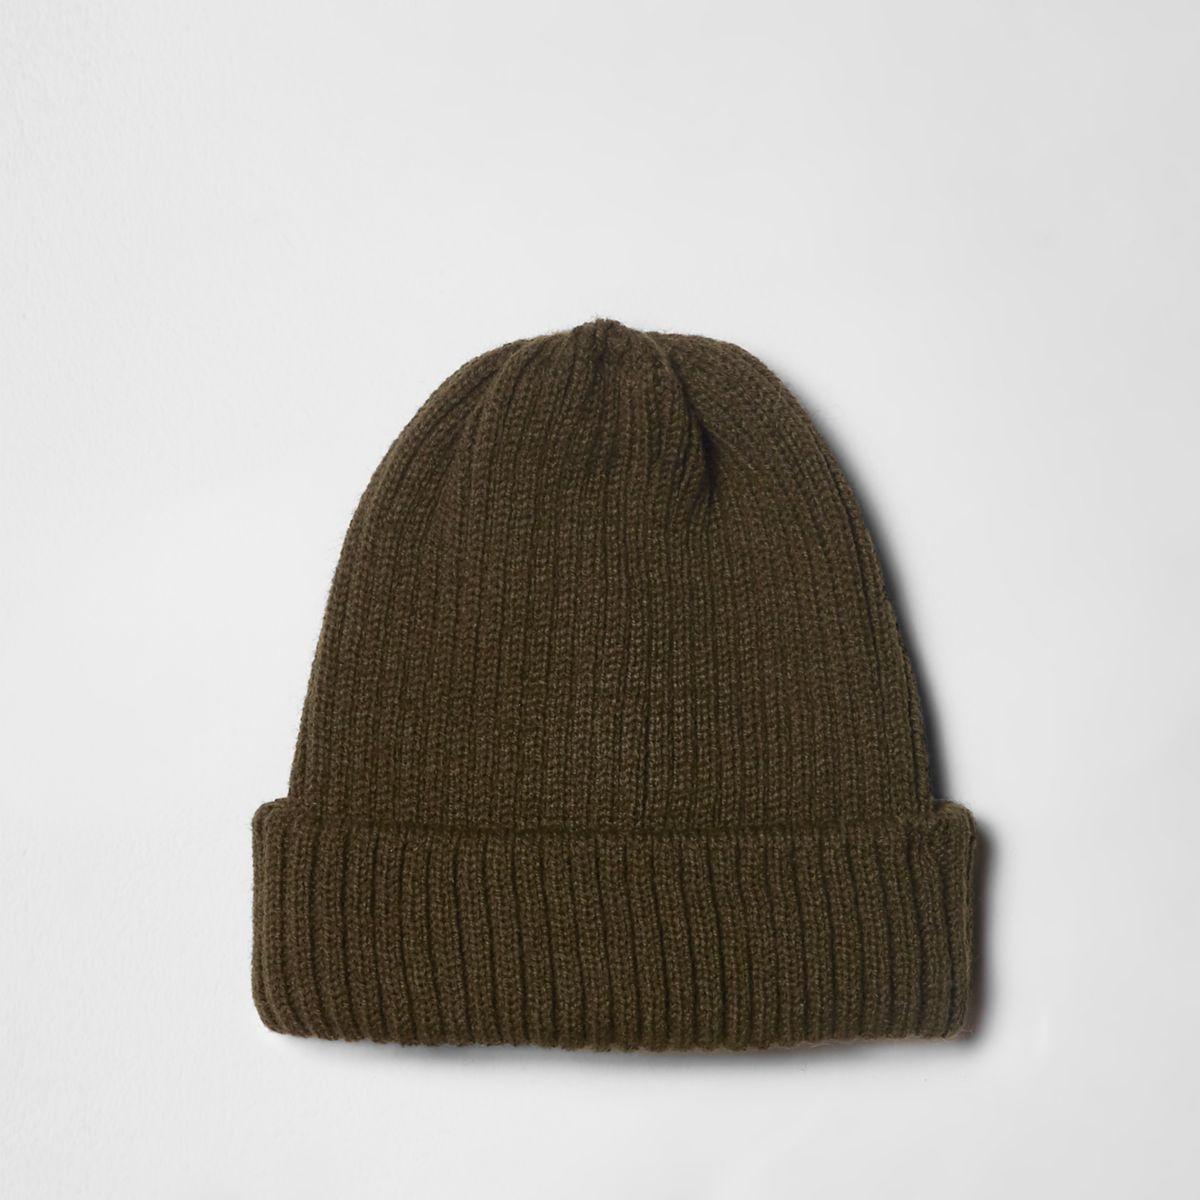 Khaki green rib knit fisherman beanie hat